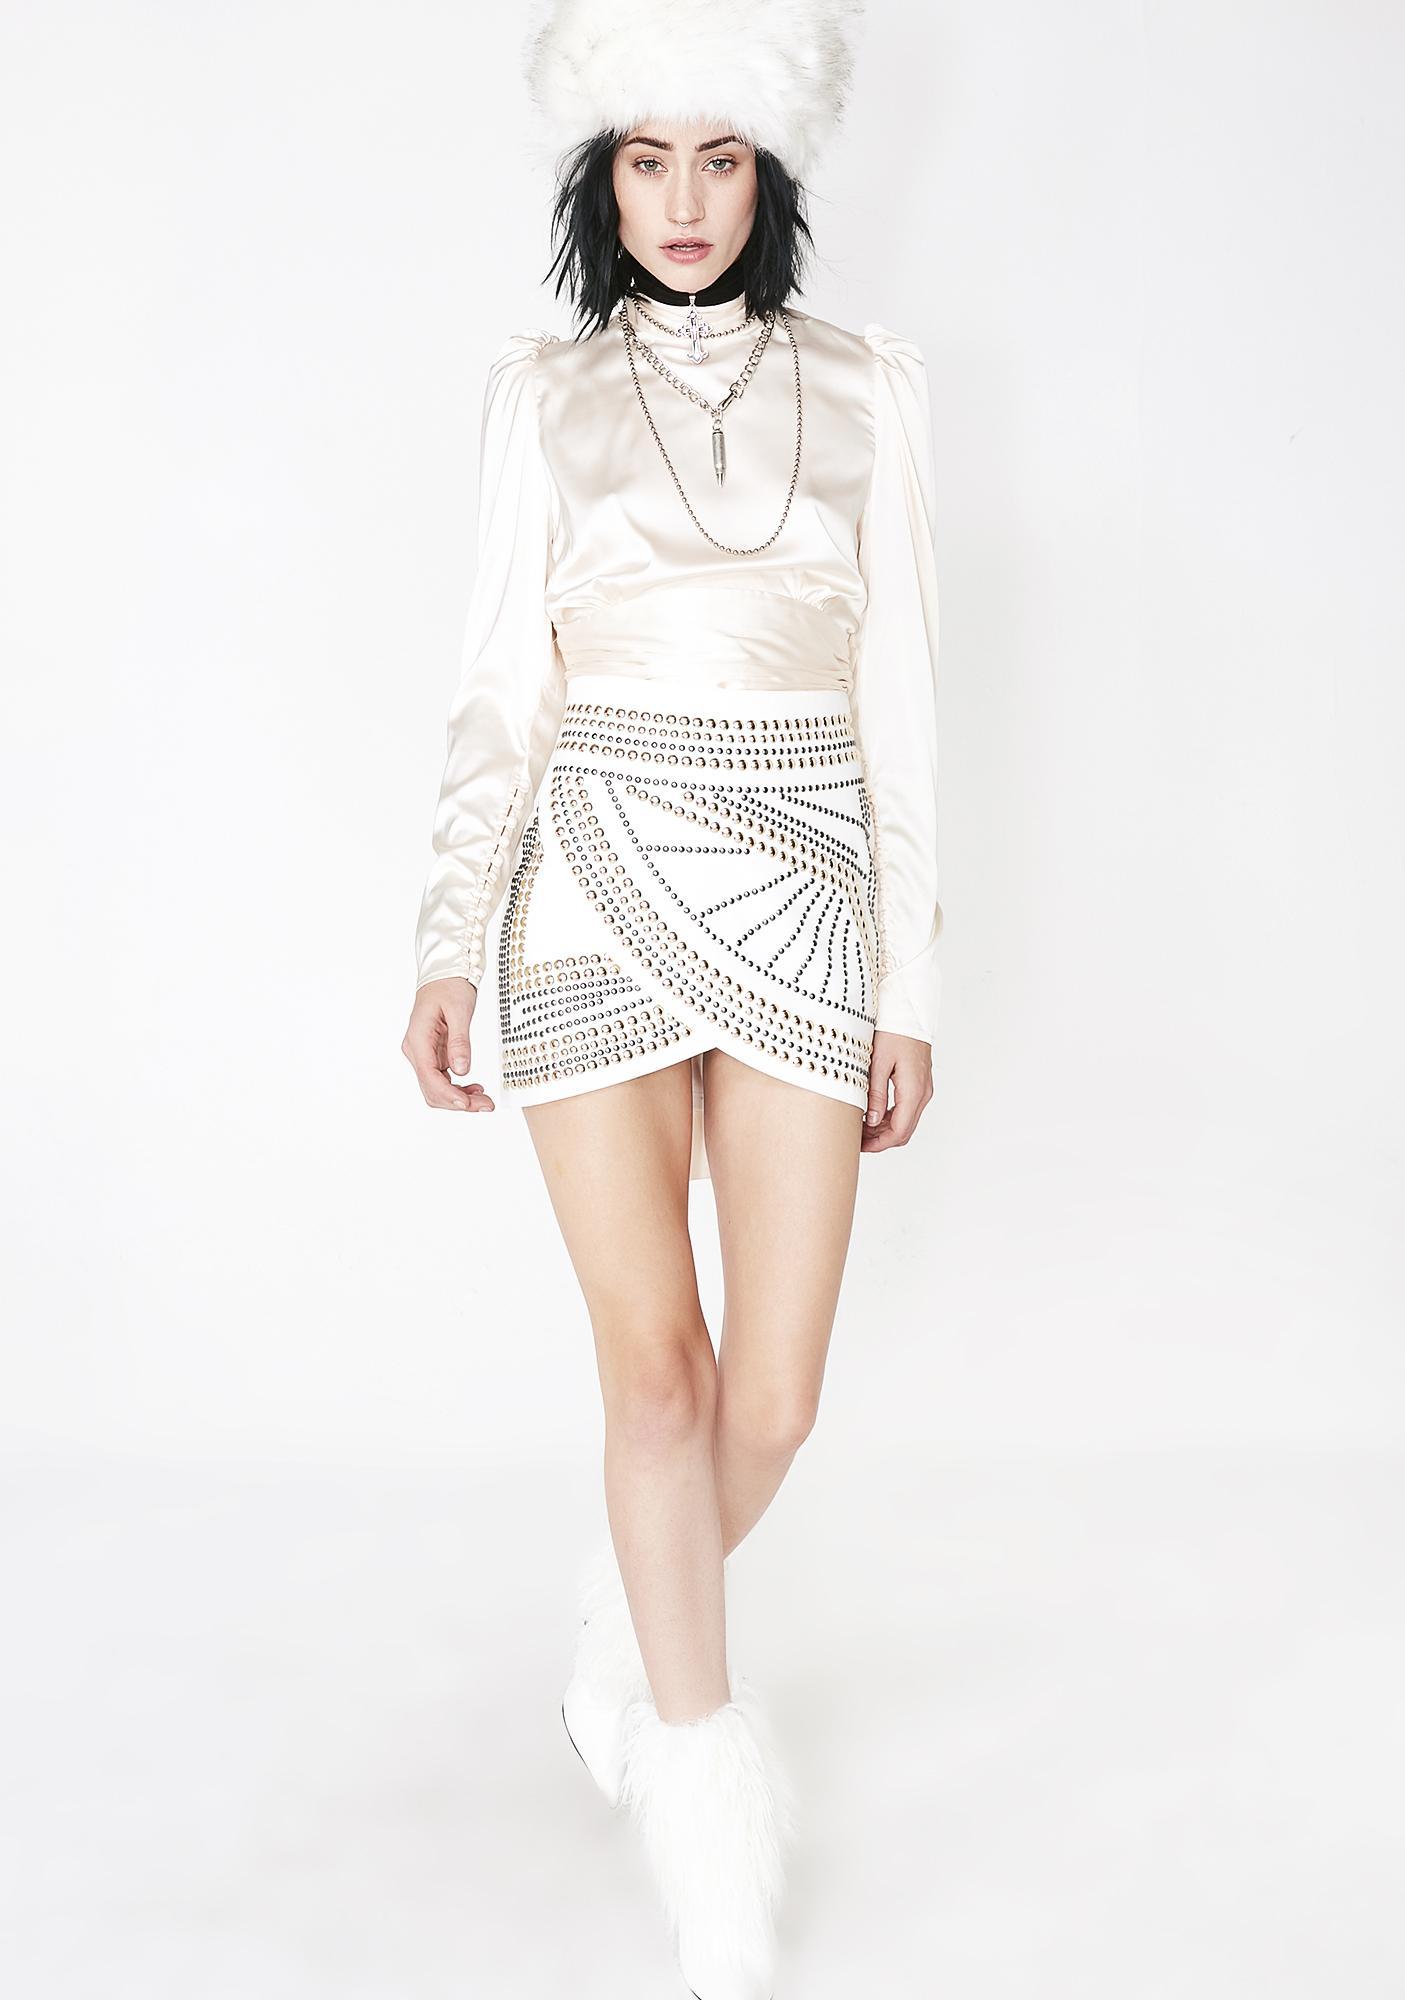 e7982c4d4 ... Pure Rock N' Roll Queen Mini Skirt ...